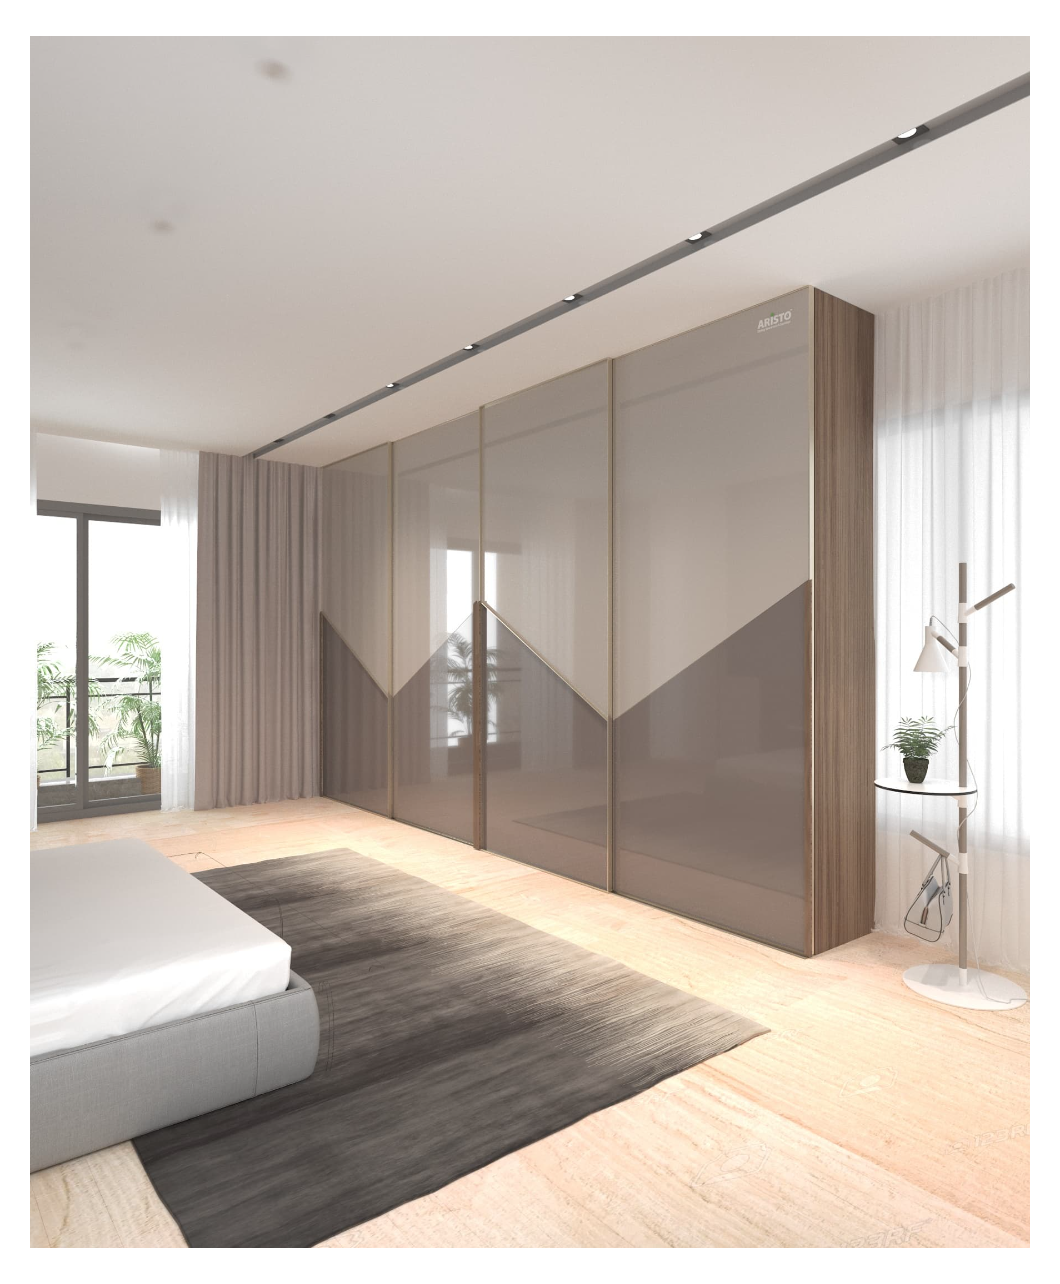 Aristo Collections Mosaic Wardrobe Design Bedroom Sliding Modern Wardrob In 2021 Wardrobe Design Bedroom Sliding Door Wardrobe Designs Bedroom Furniture Design